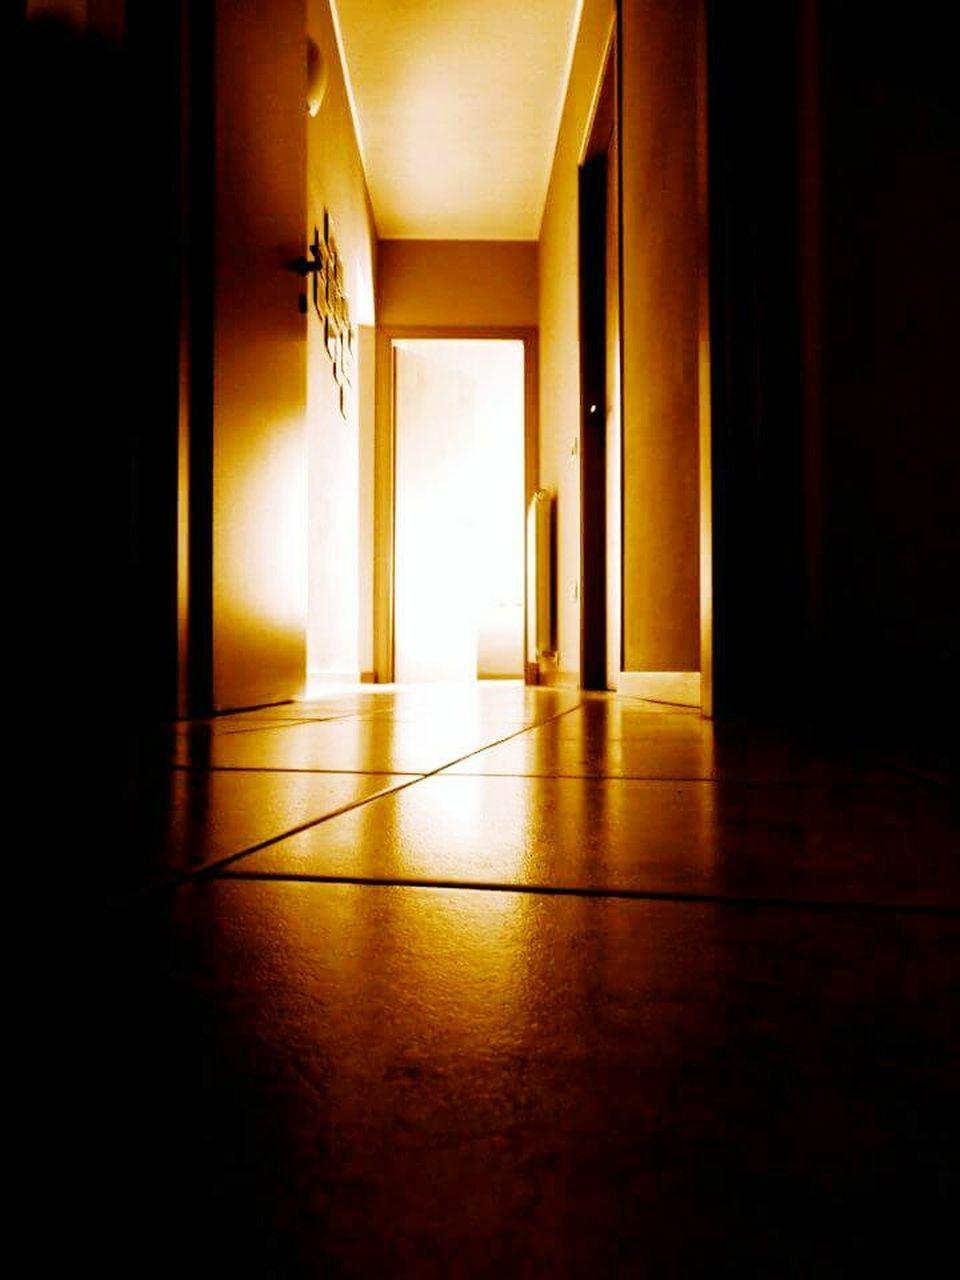 indoors, home interior, window, illuminated, room, domestic room, house, lighting equipment, dark, architecture, absence, curtain, built structure, flooring, empty, wall - building feature, darkroom, door, light - natural phenomenon, no people